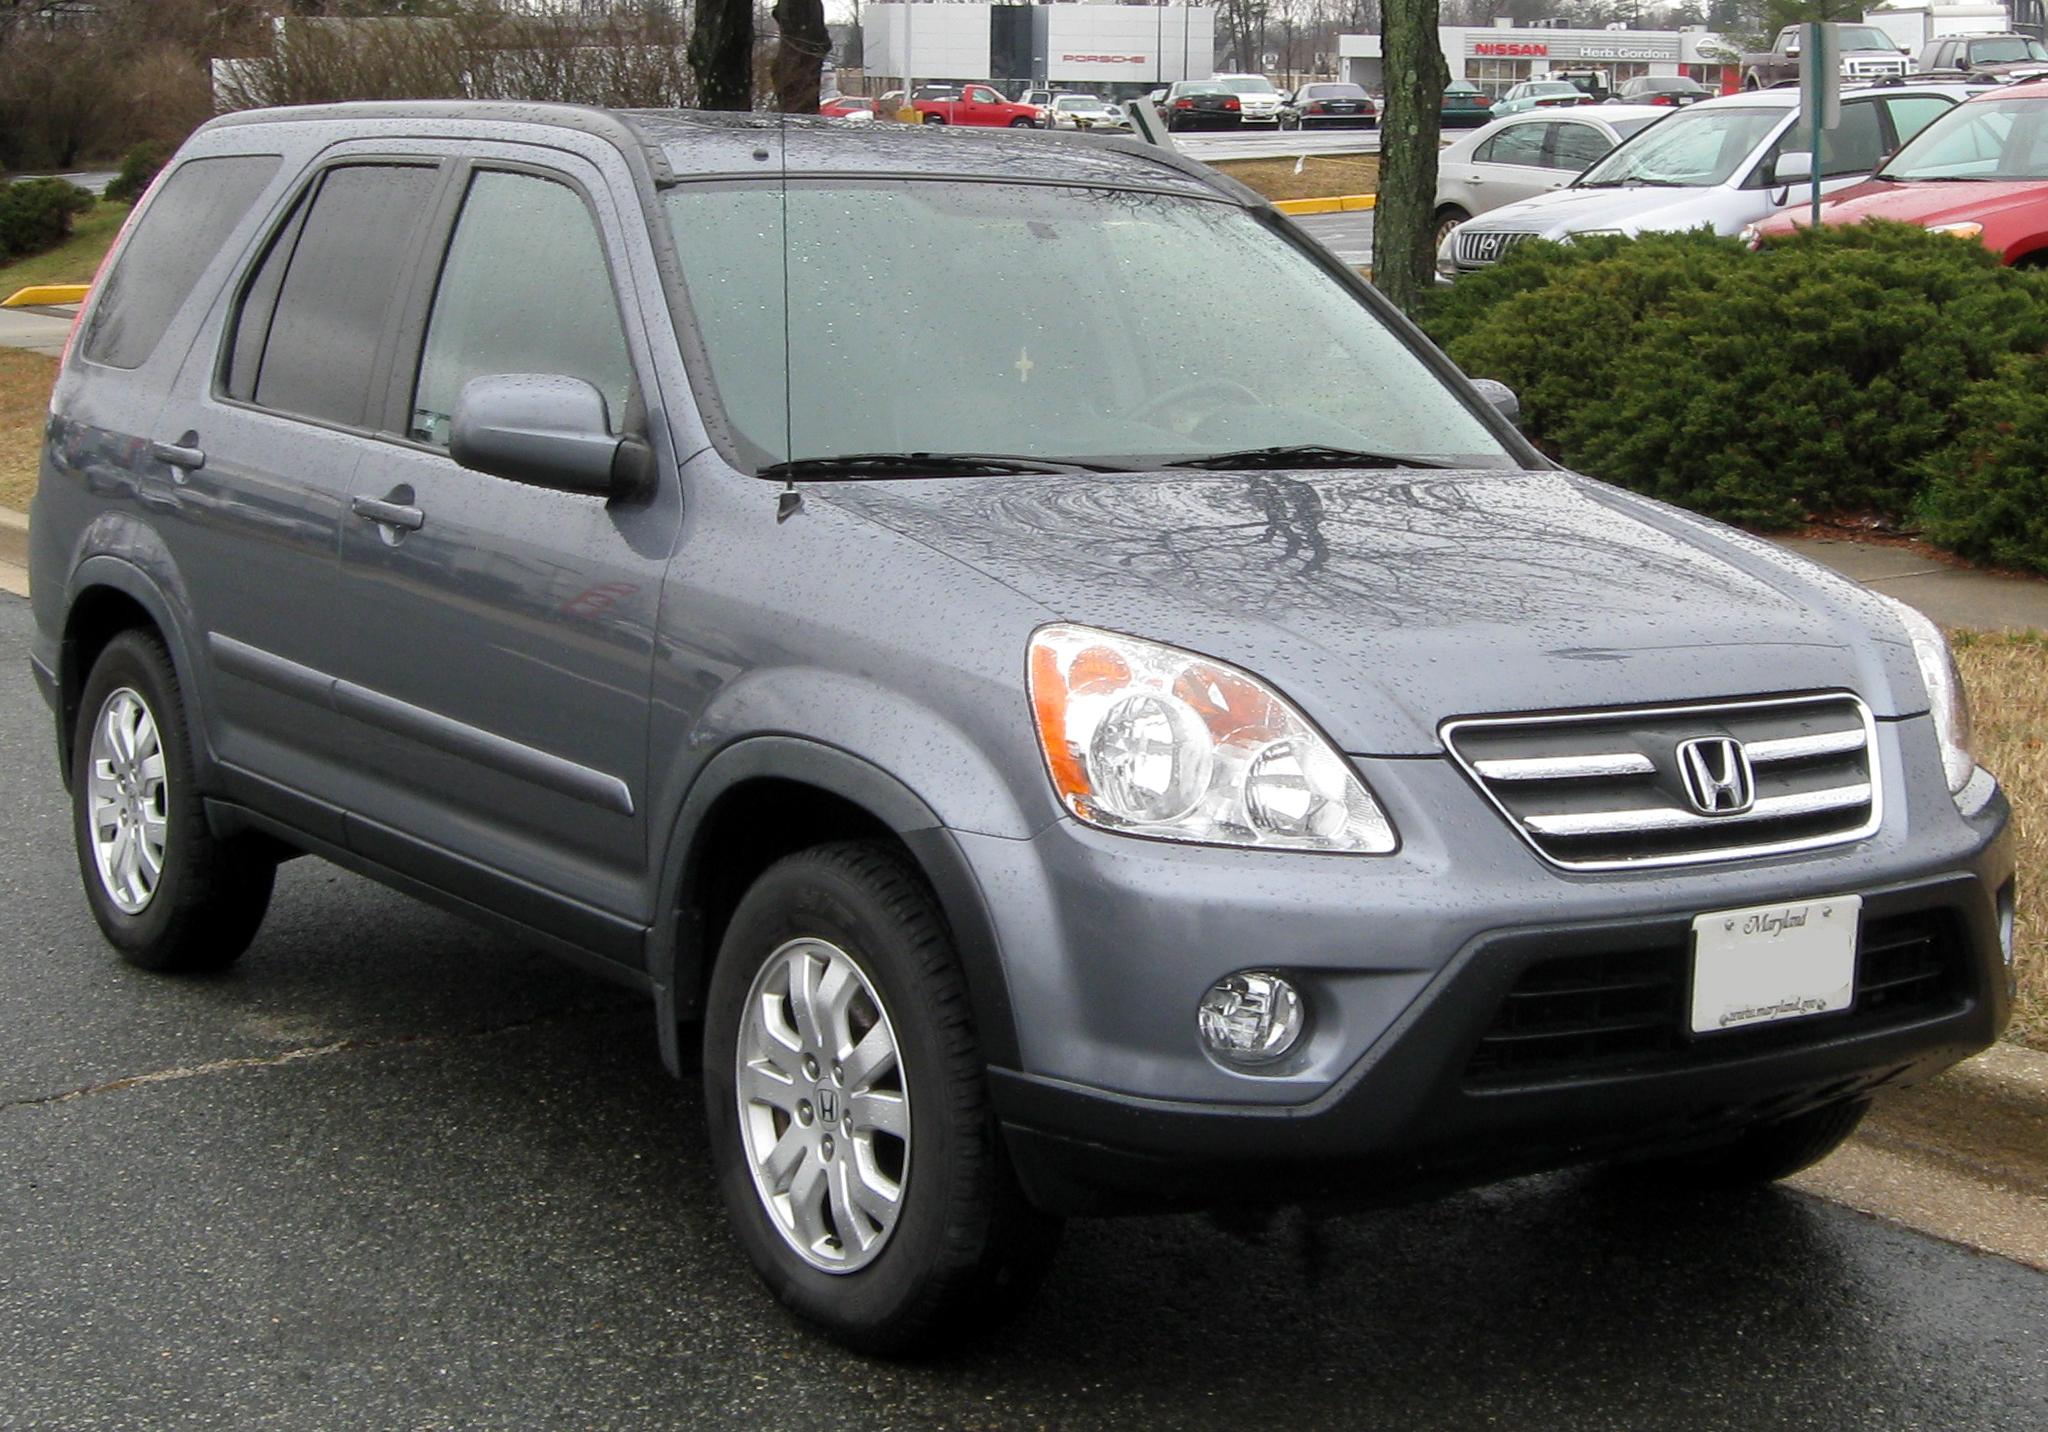 File:2005-2006 Honda CR-V -- 02-29-2012